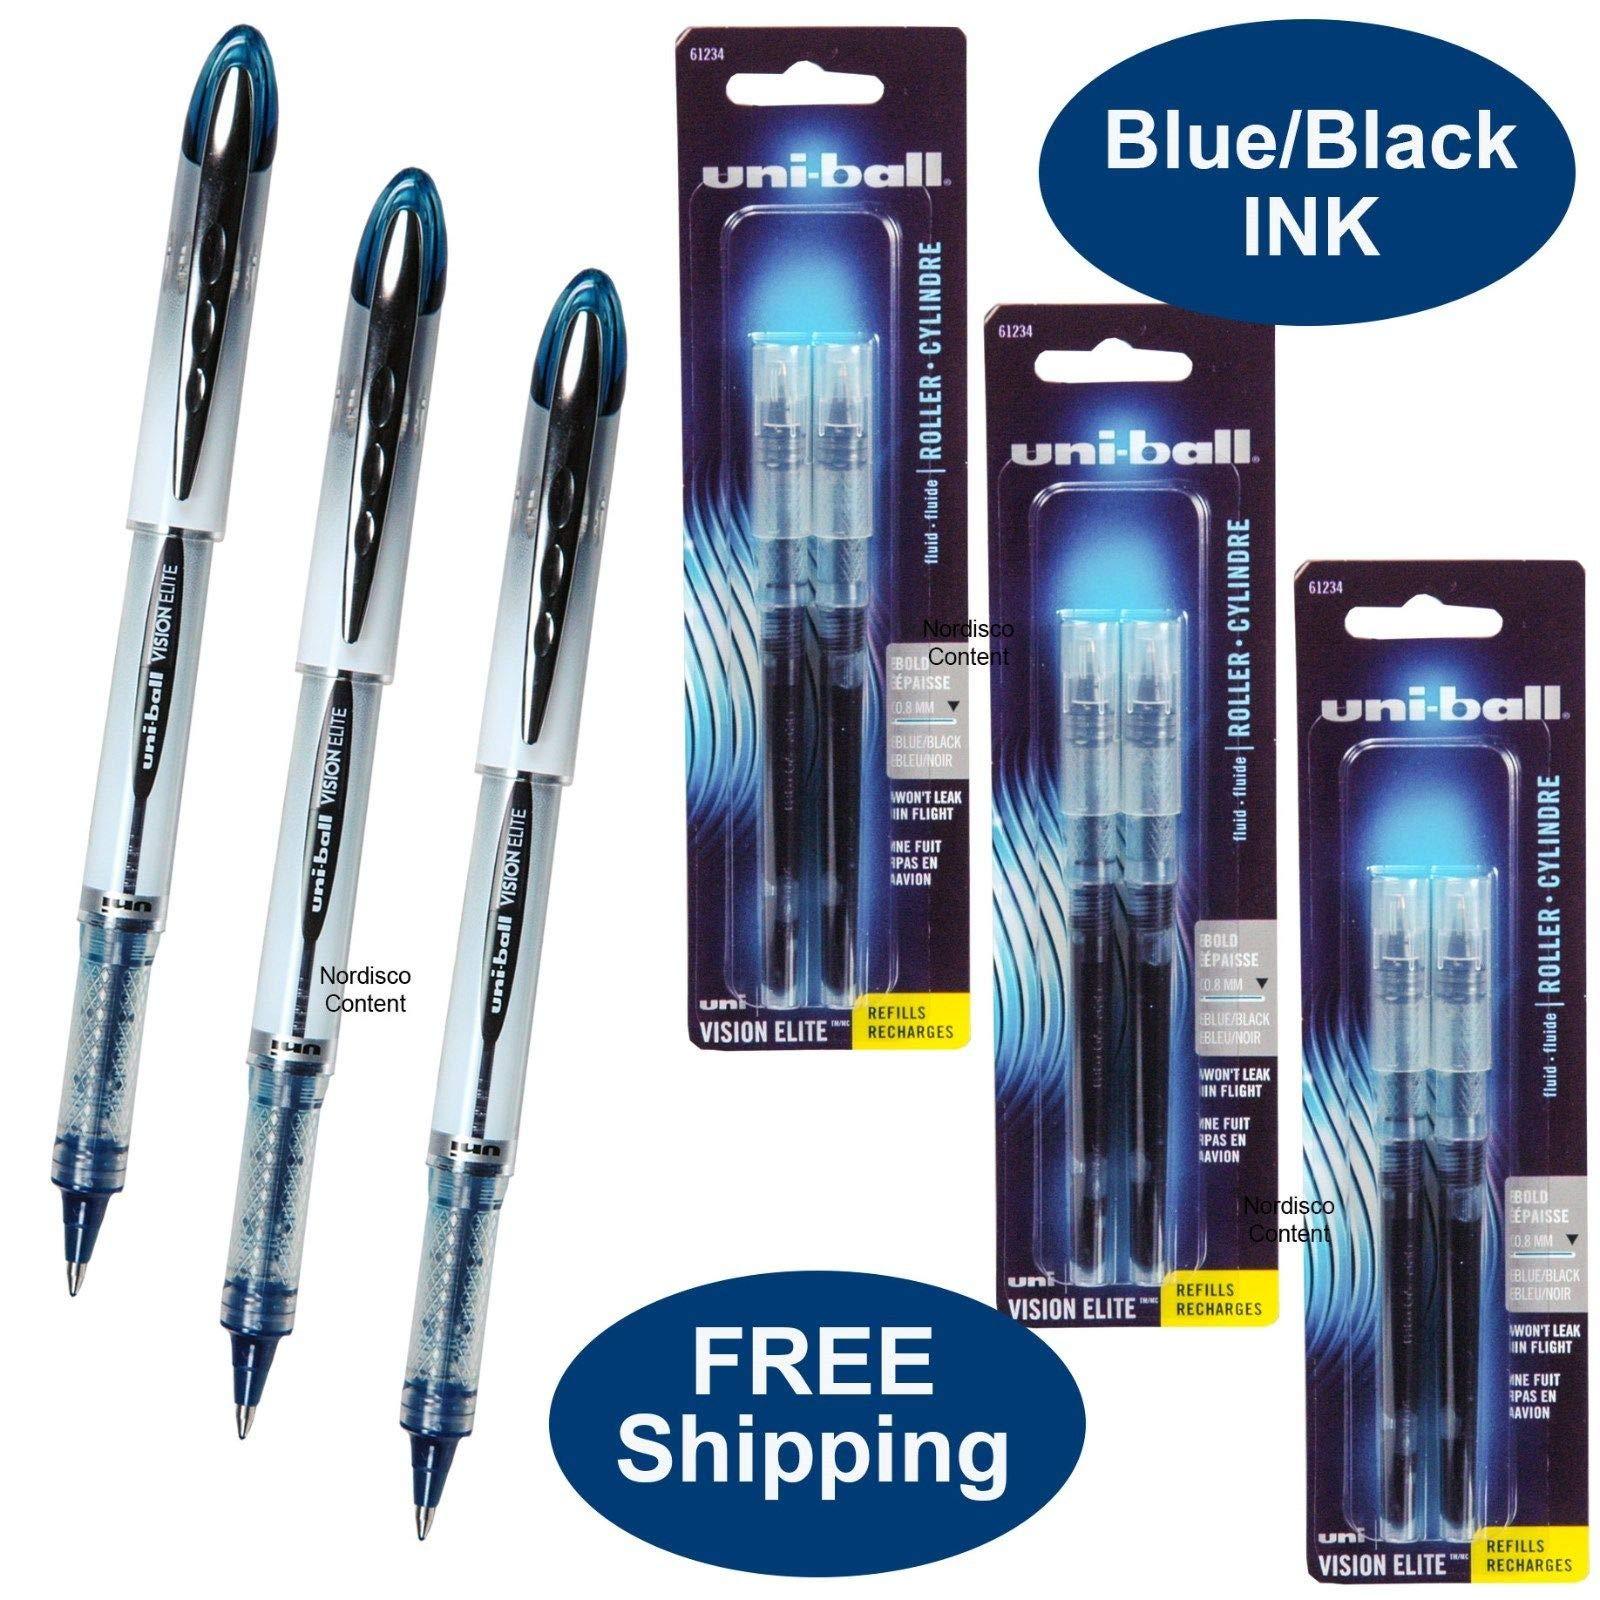 Uni-ball Vision Elite, Blue Black Ink, 3 Pens Plus 3 Packs of Refills, 0.8mm Bold Point